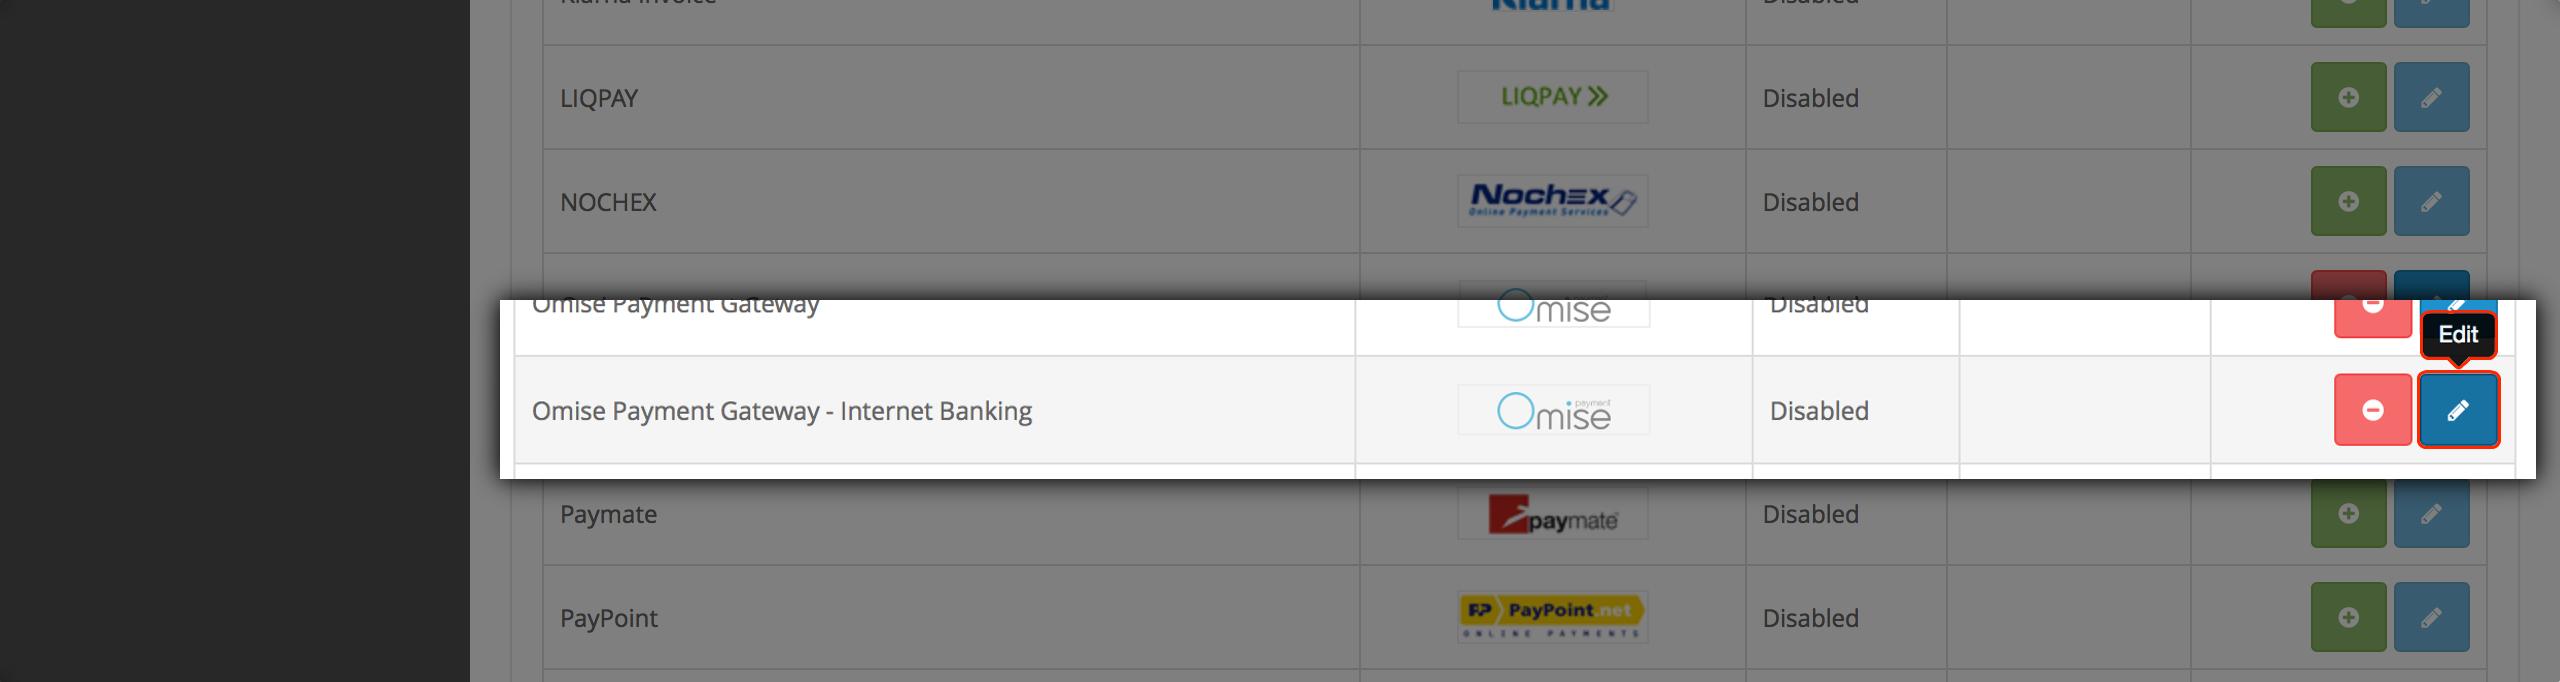 Configure Omise Payment Gateway - Internet Banking extension